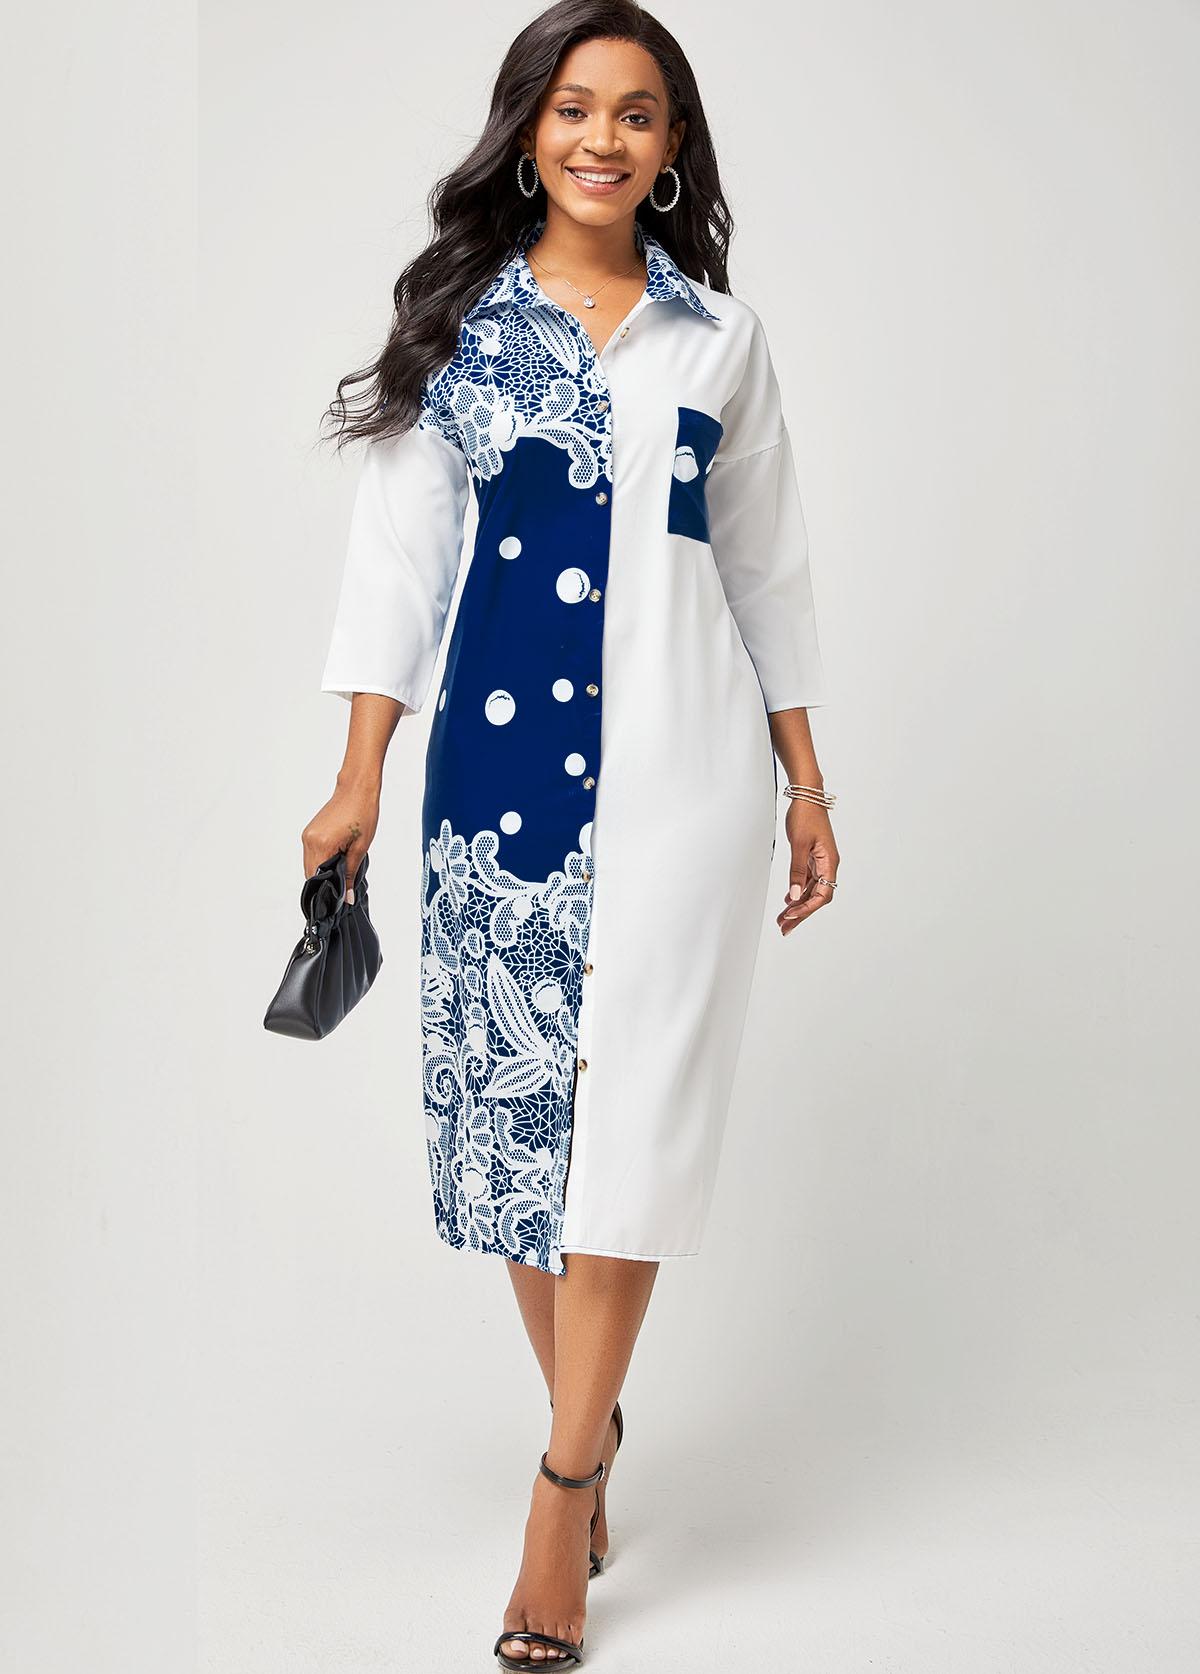 Printed Turndown Collar Button Up Dress